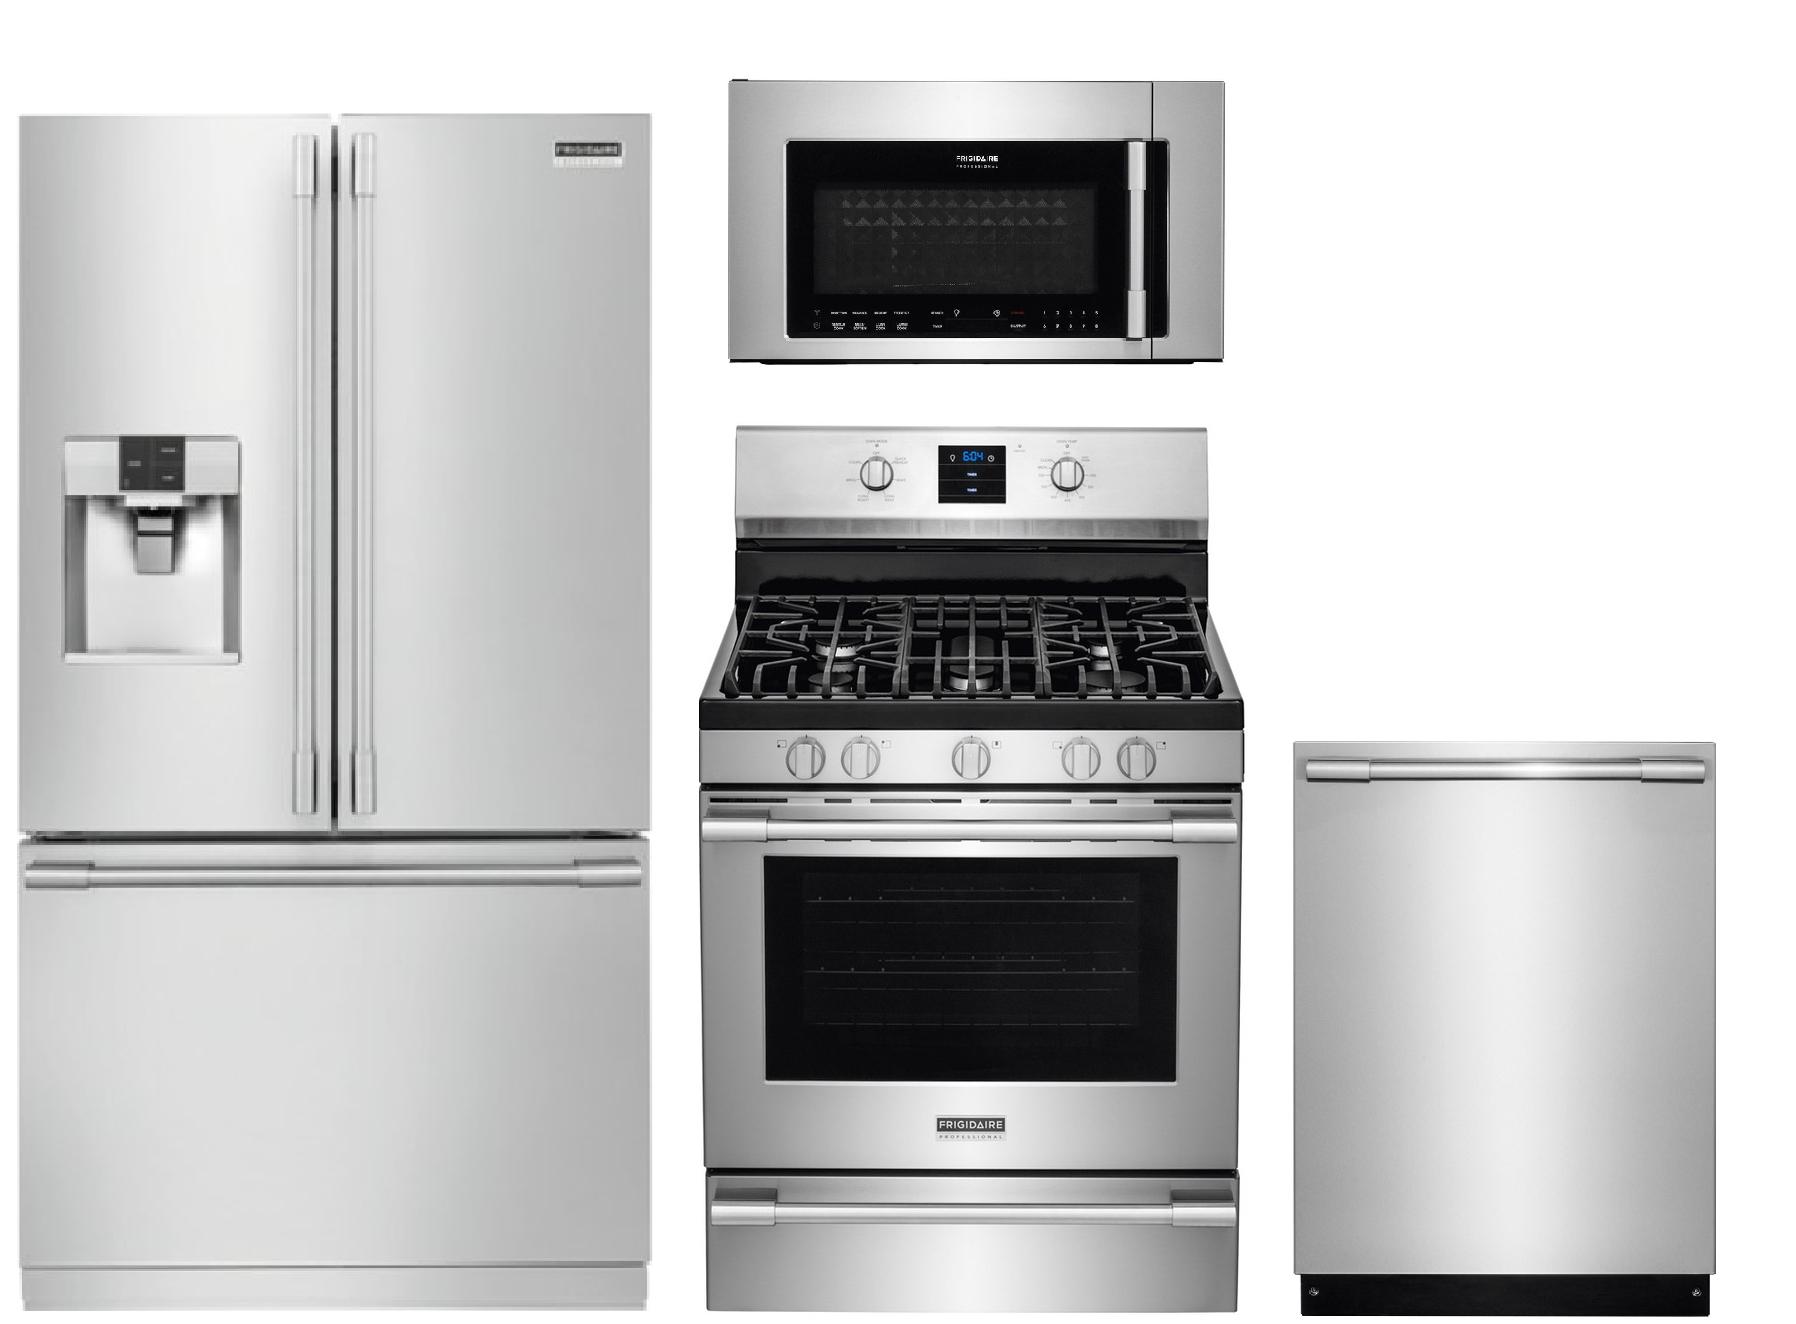 frigidaire professional 4 piece kitchen appliances package in